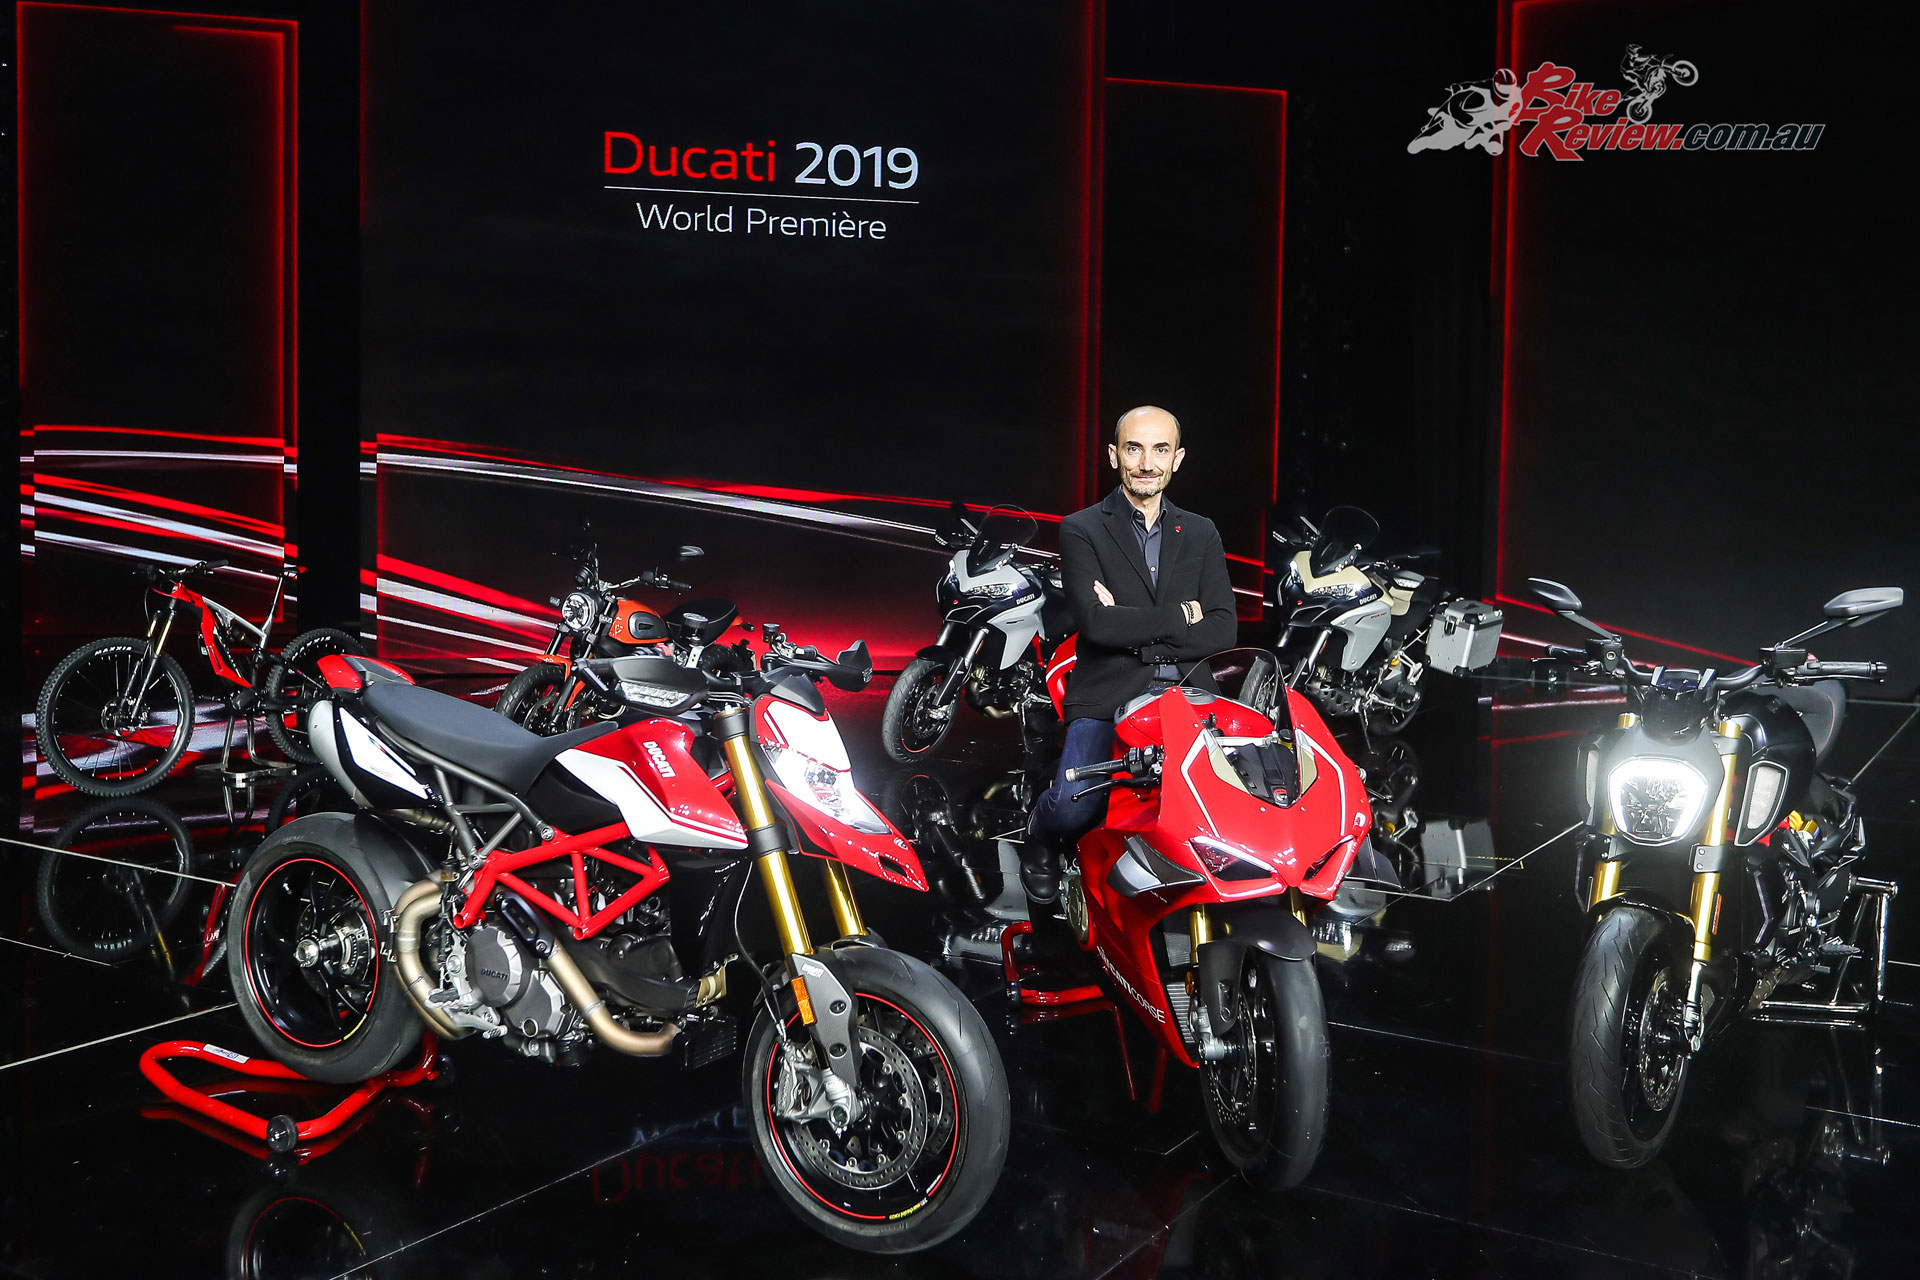 Ducati World Première 2019